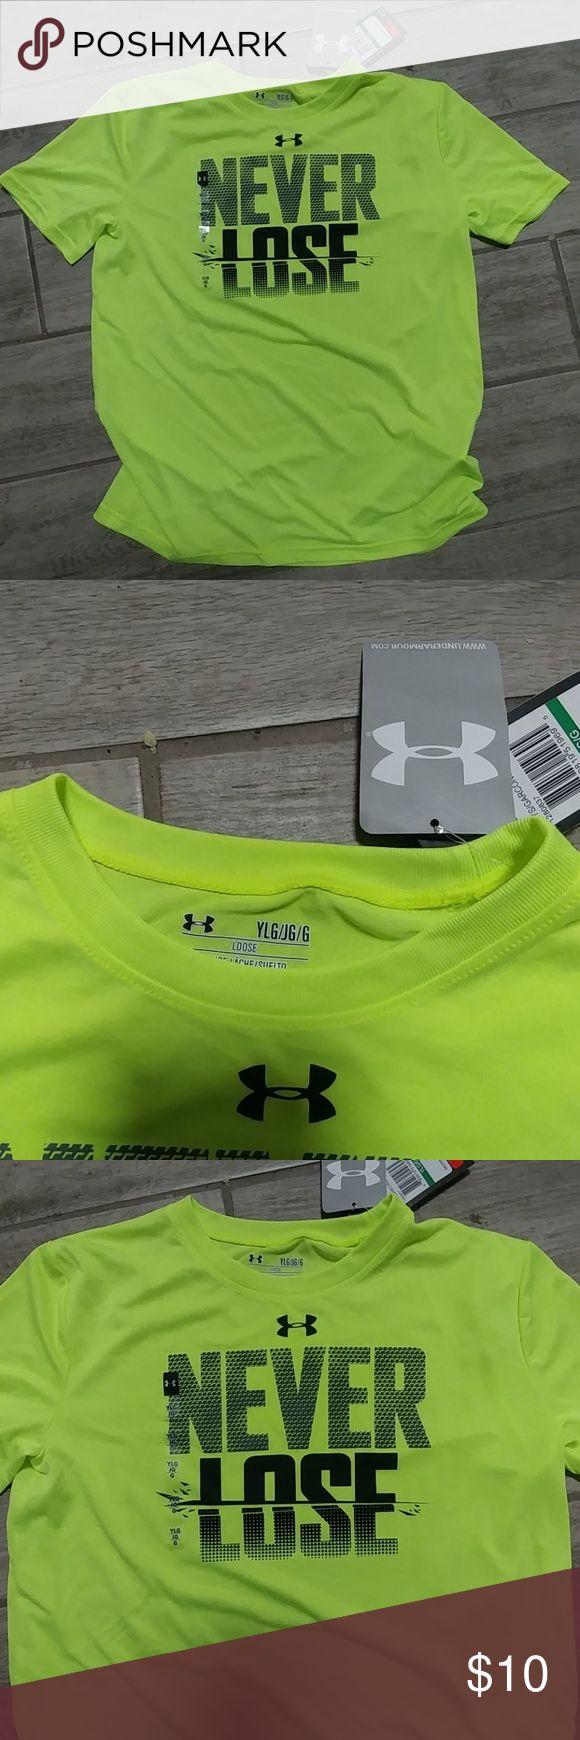 Shirt Kids slinky lime green loose sport tee. Heat gear technology. Keeps cool. underarmour Shirts & Tops Tees - Short Sleeve